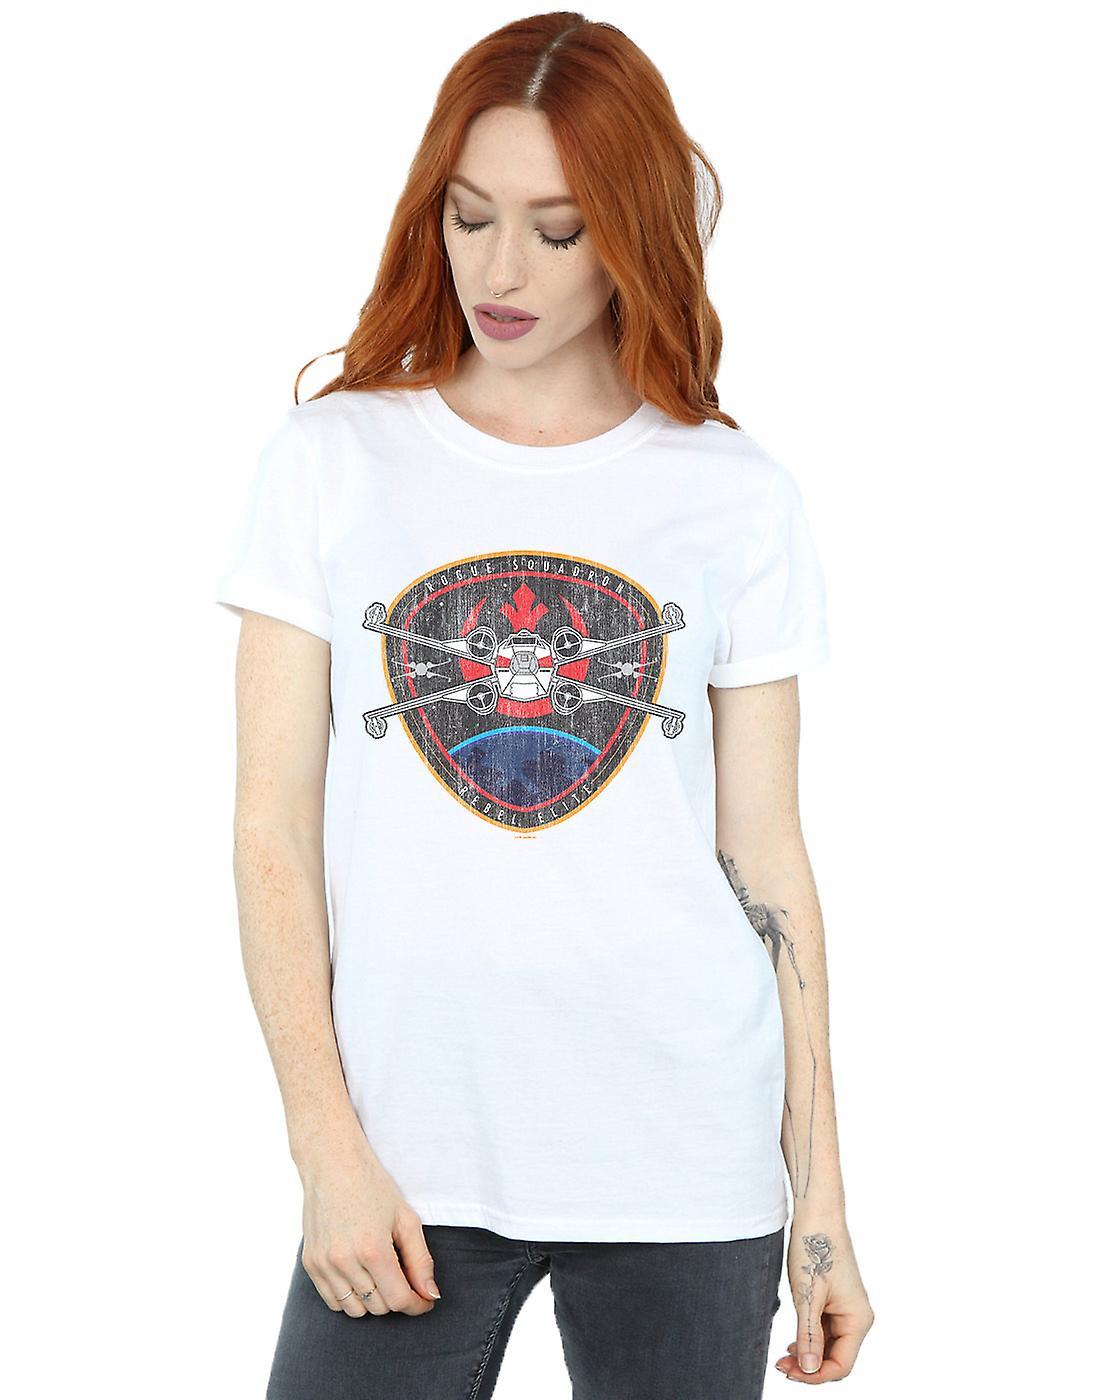 Star Wars Women's Rebel Elite Badge Boyfriend Fit T-Shirt